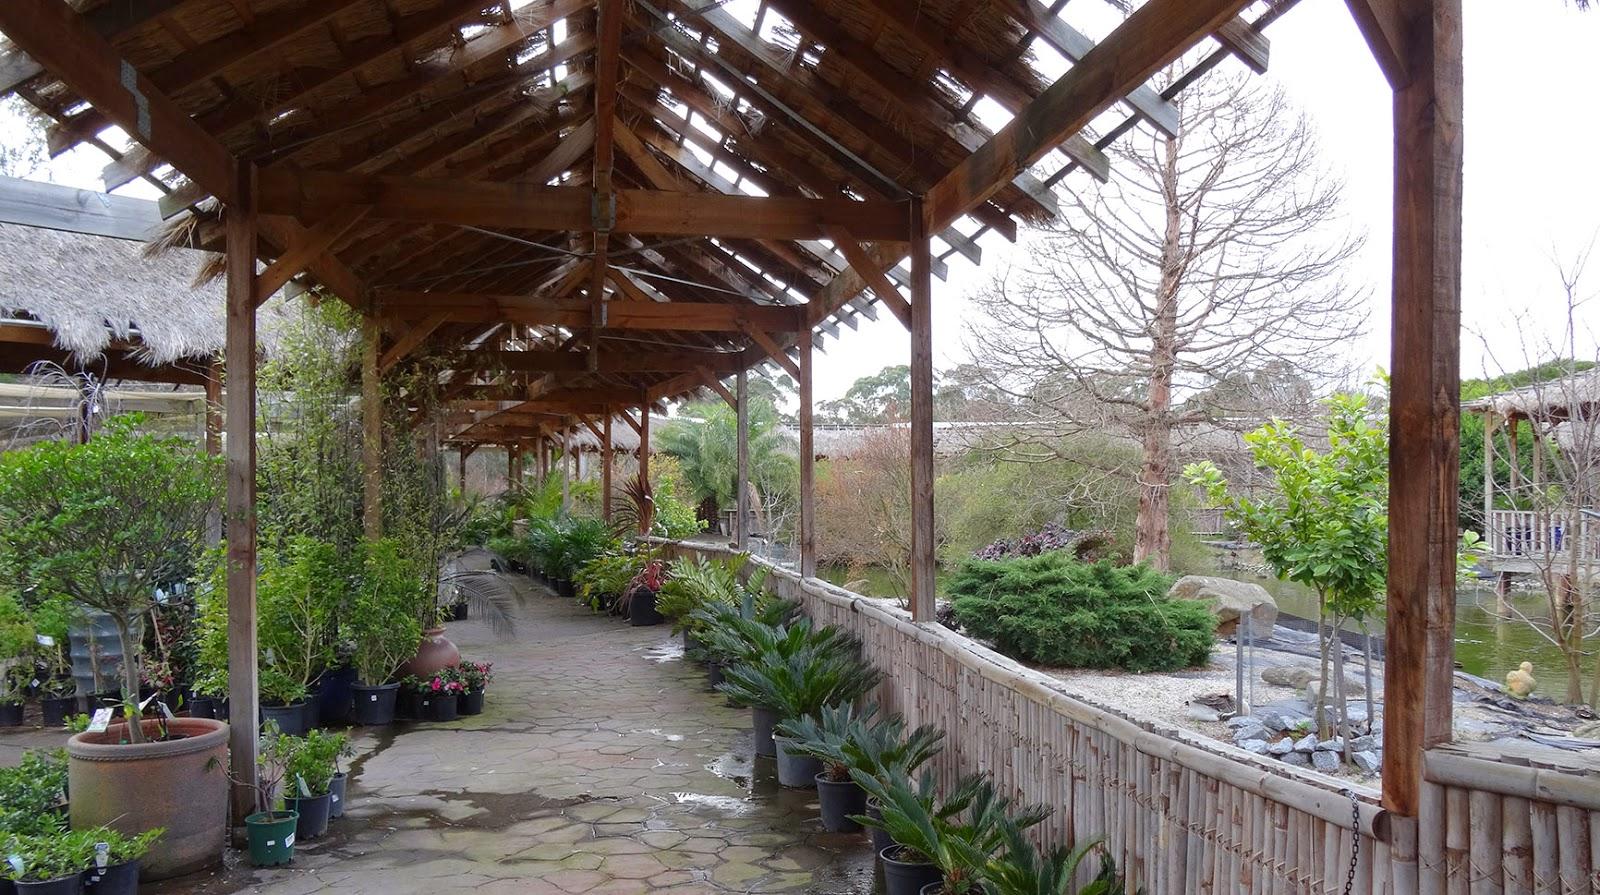 Melbourne fresh daily garden centre pond for Garden pond melbourne